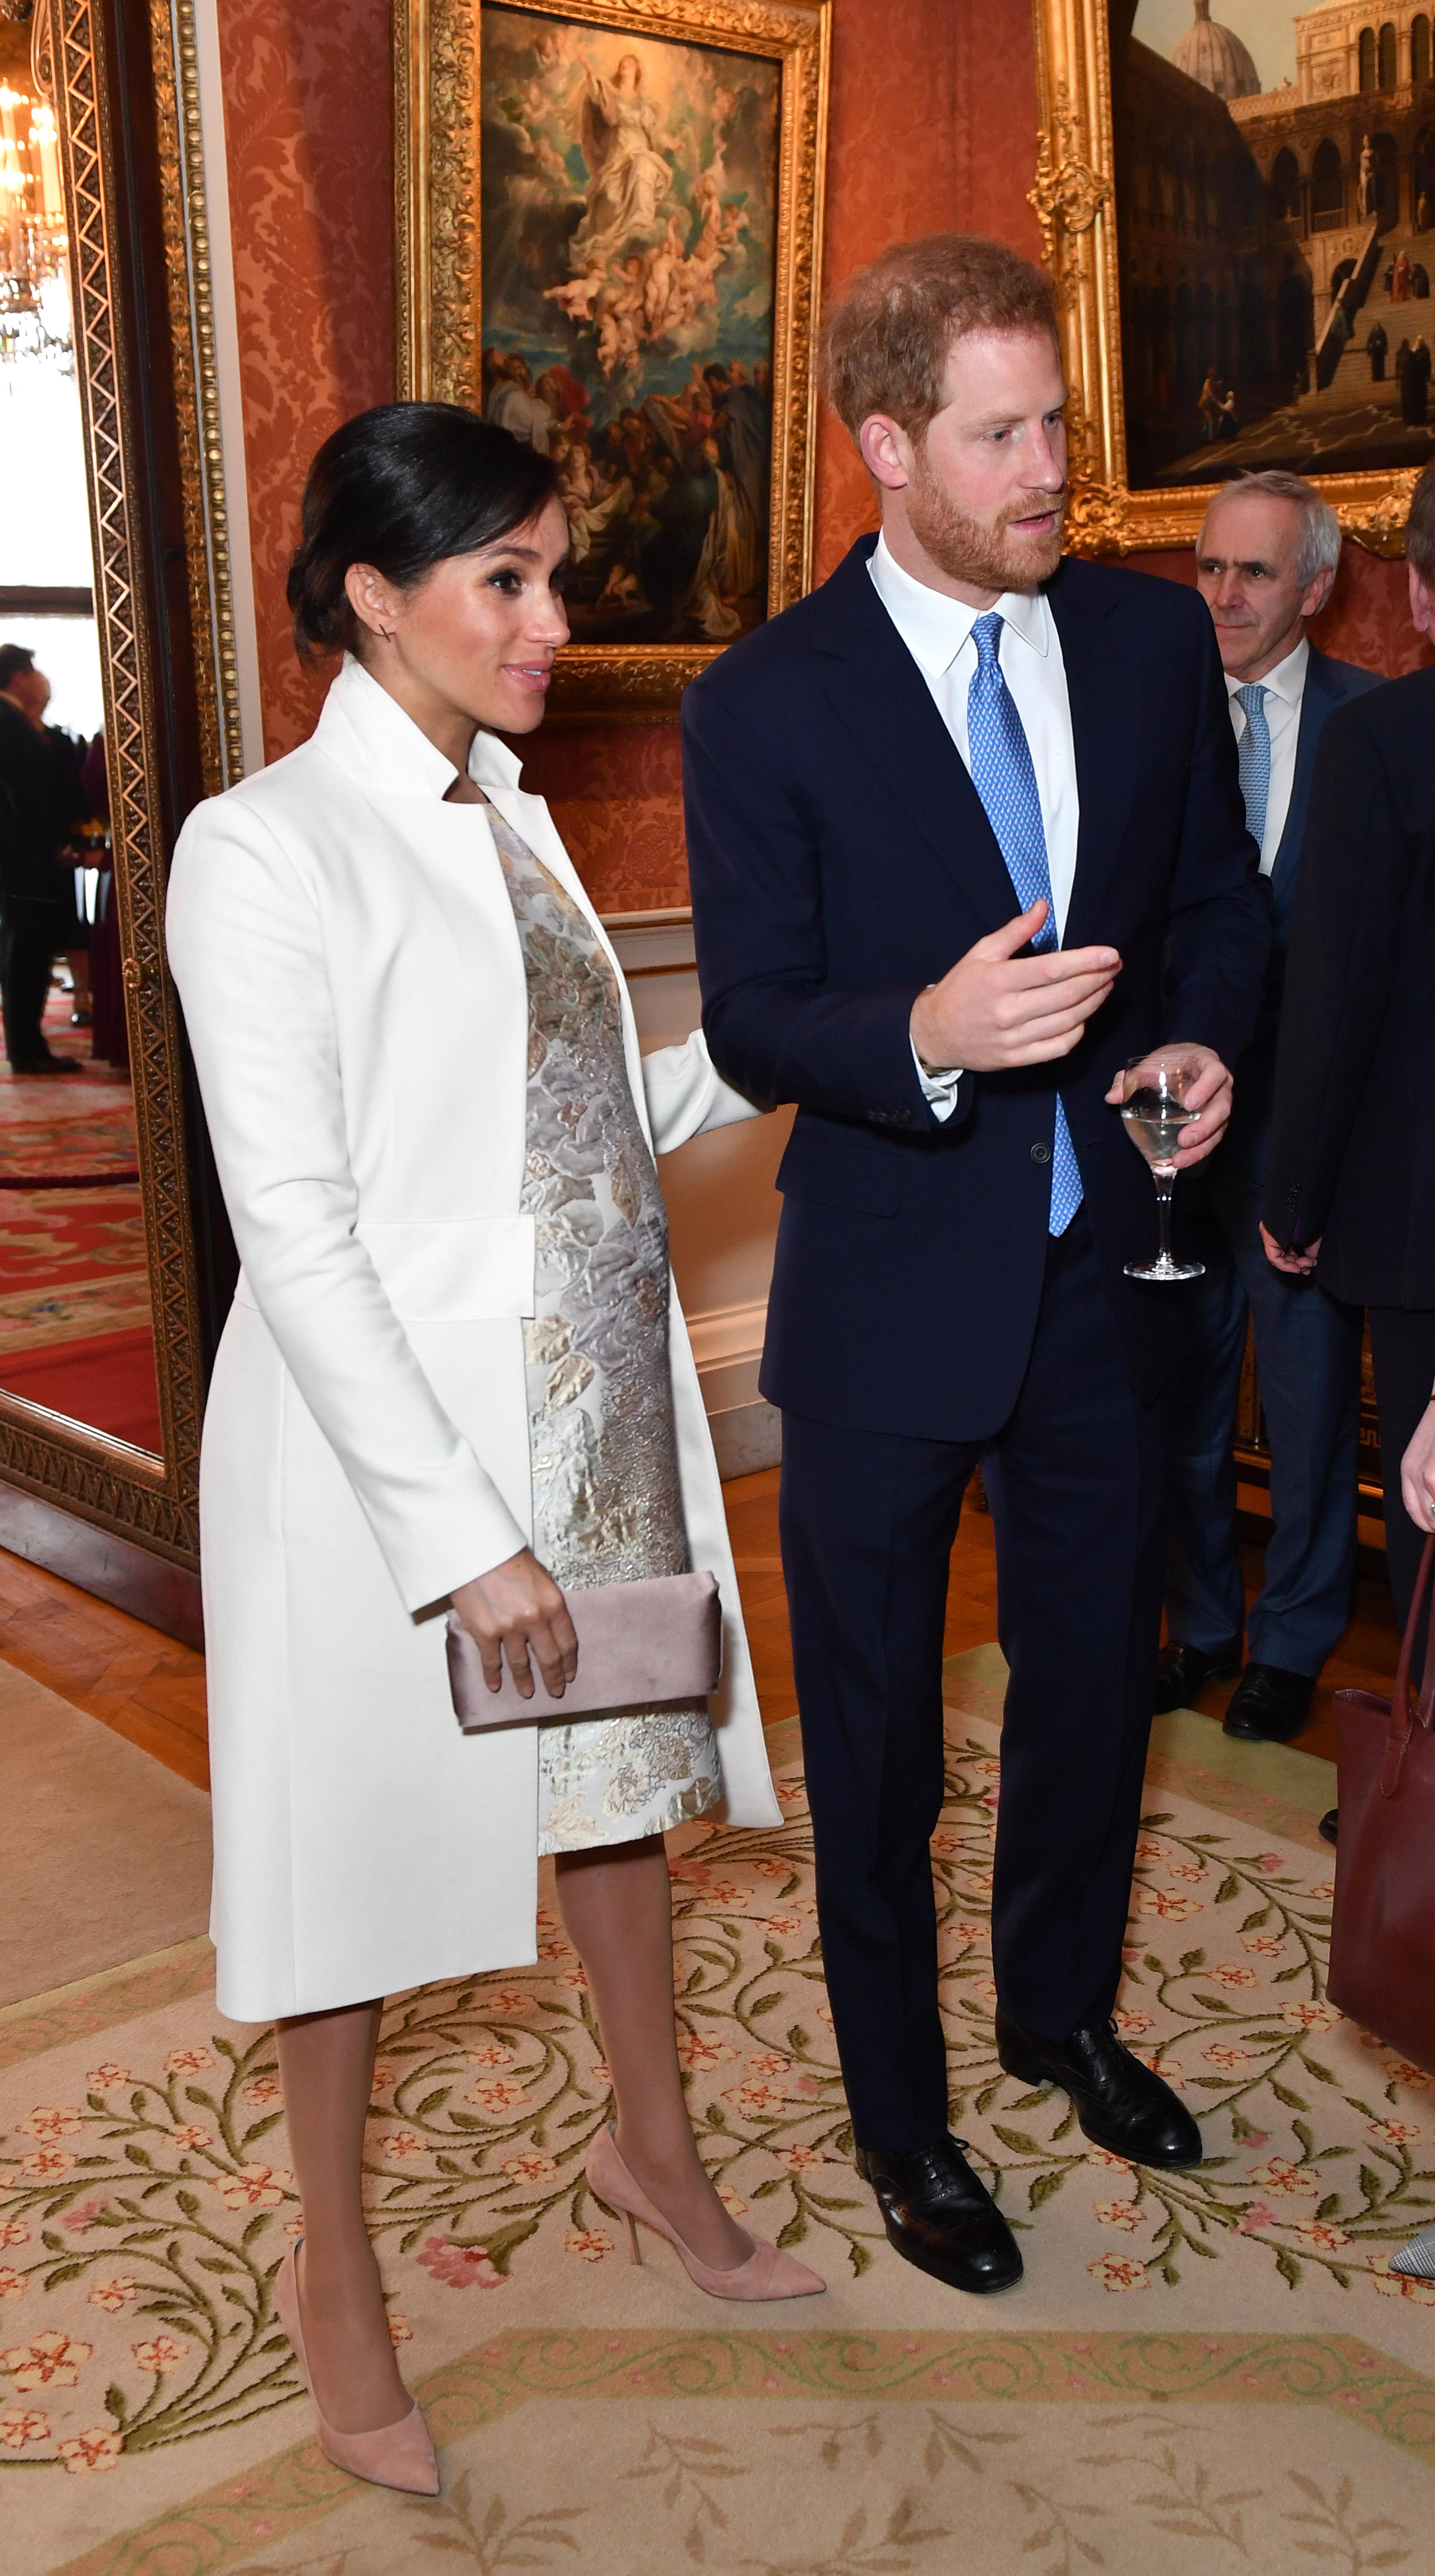 Meghan and Prince Harry